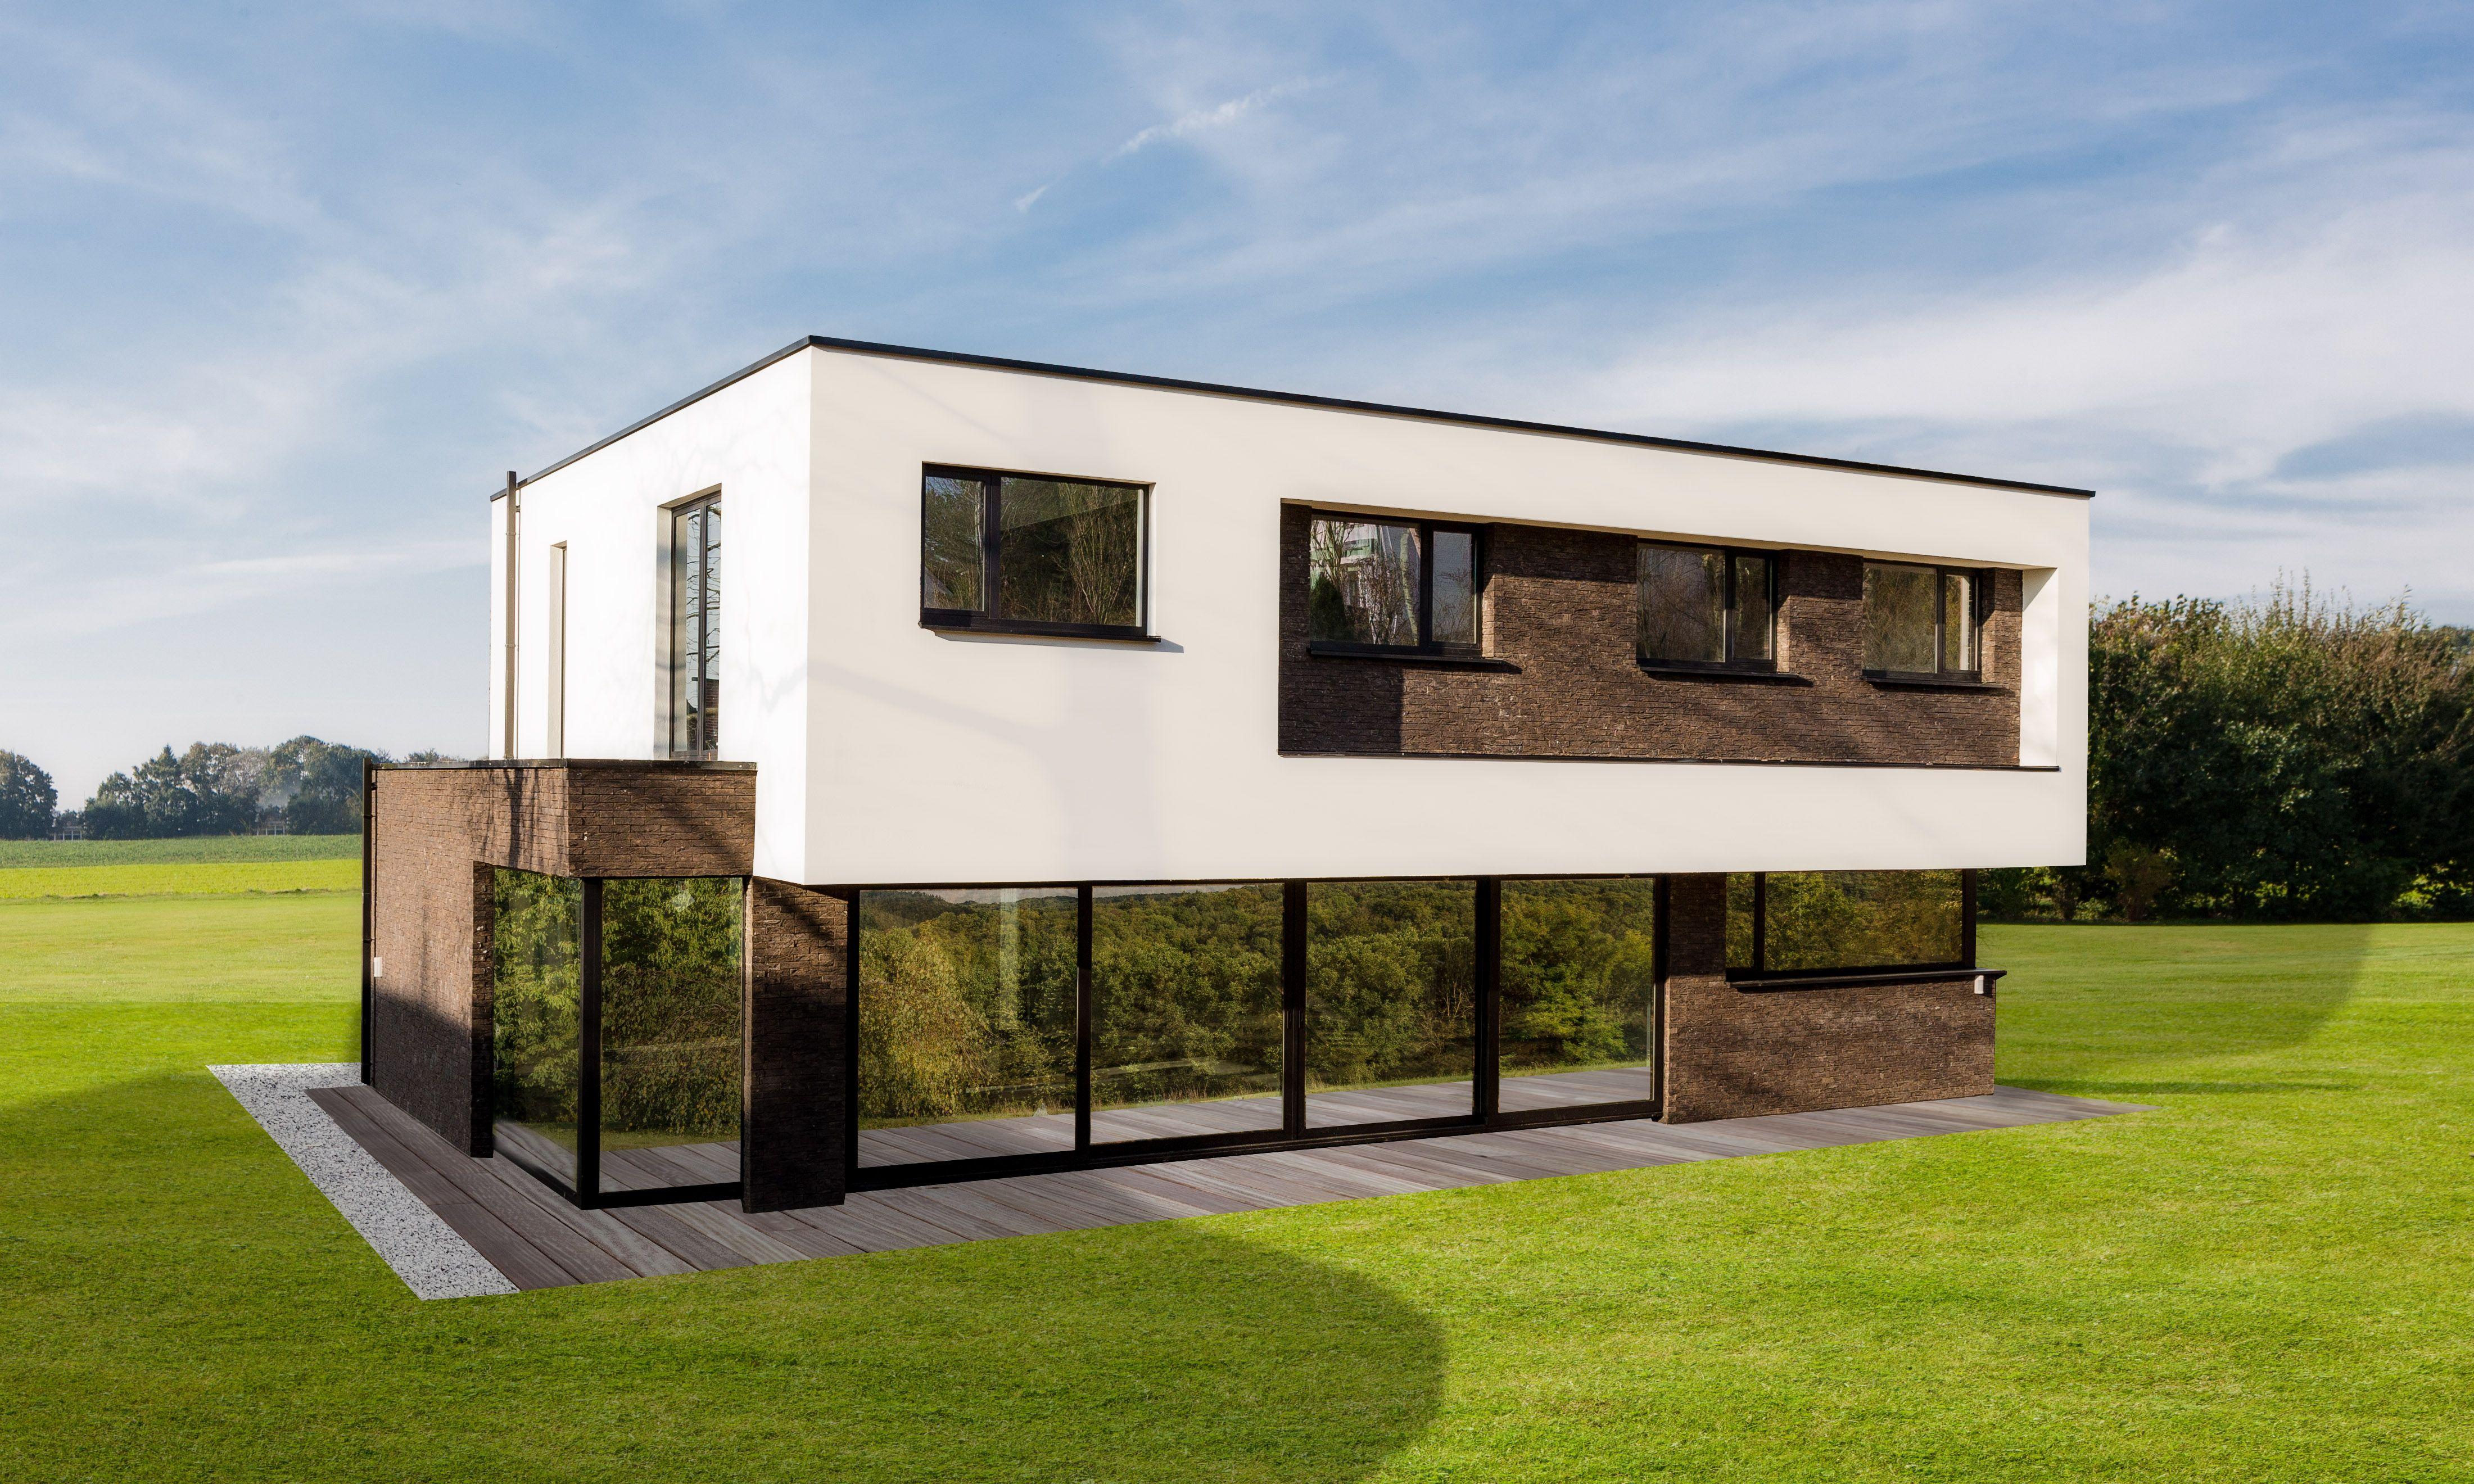 Maison moderne toiture plate | Inspirations maisons modernes ...